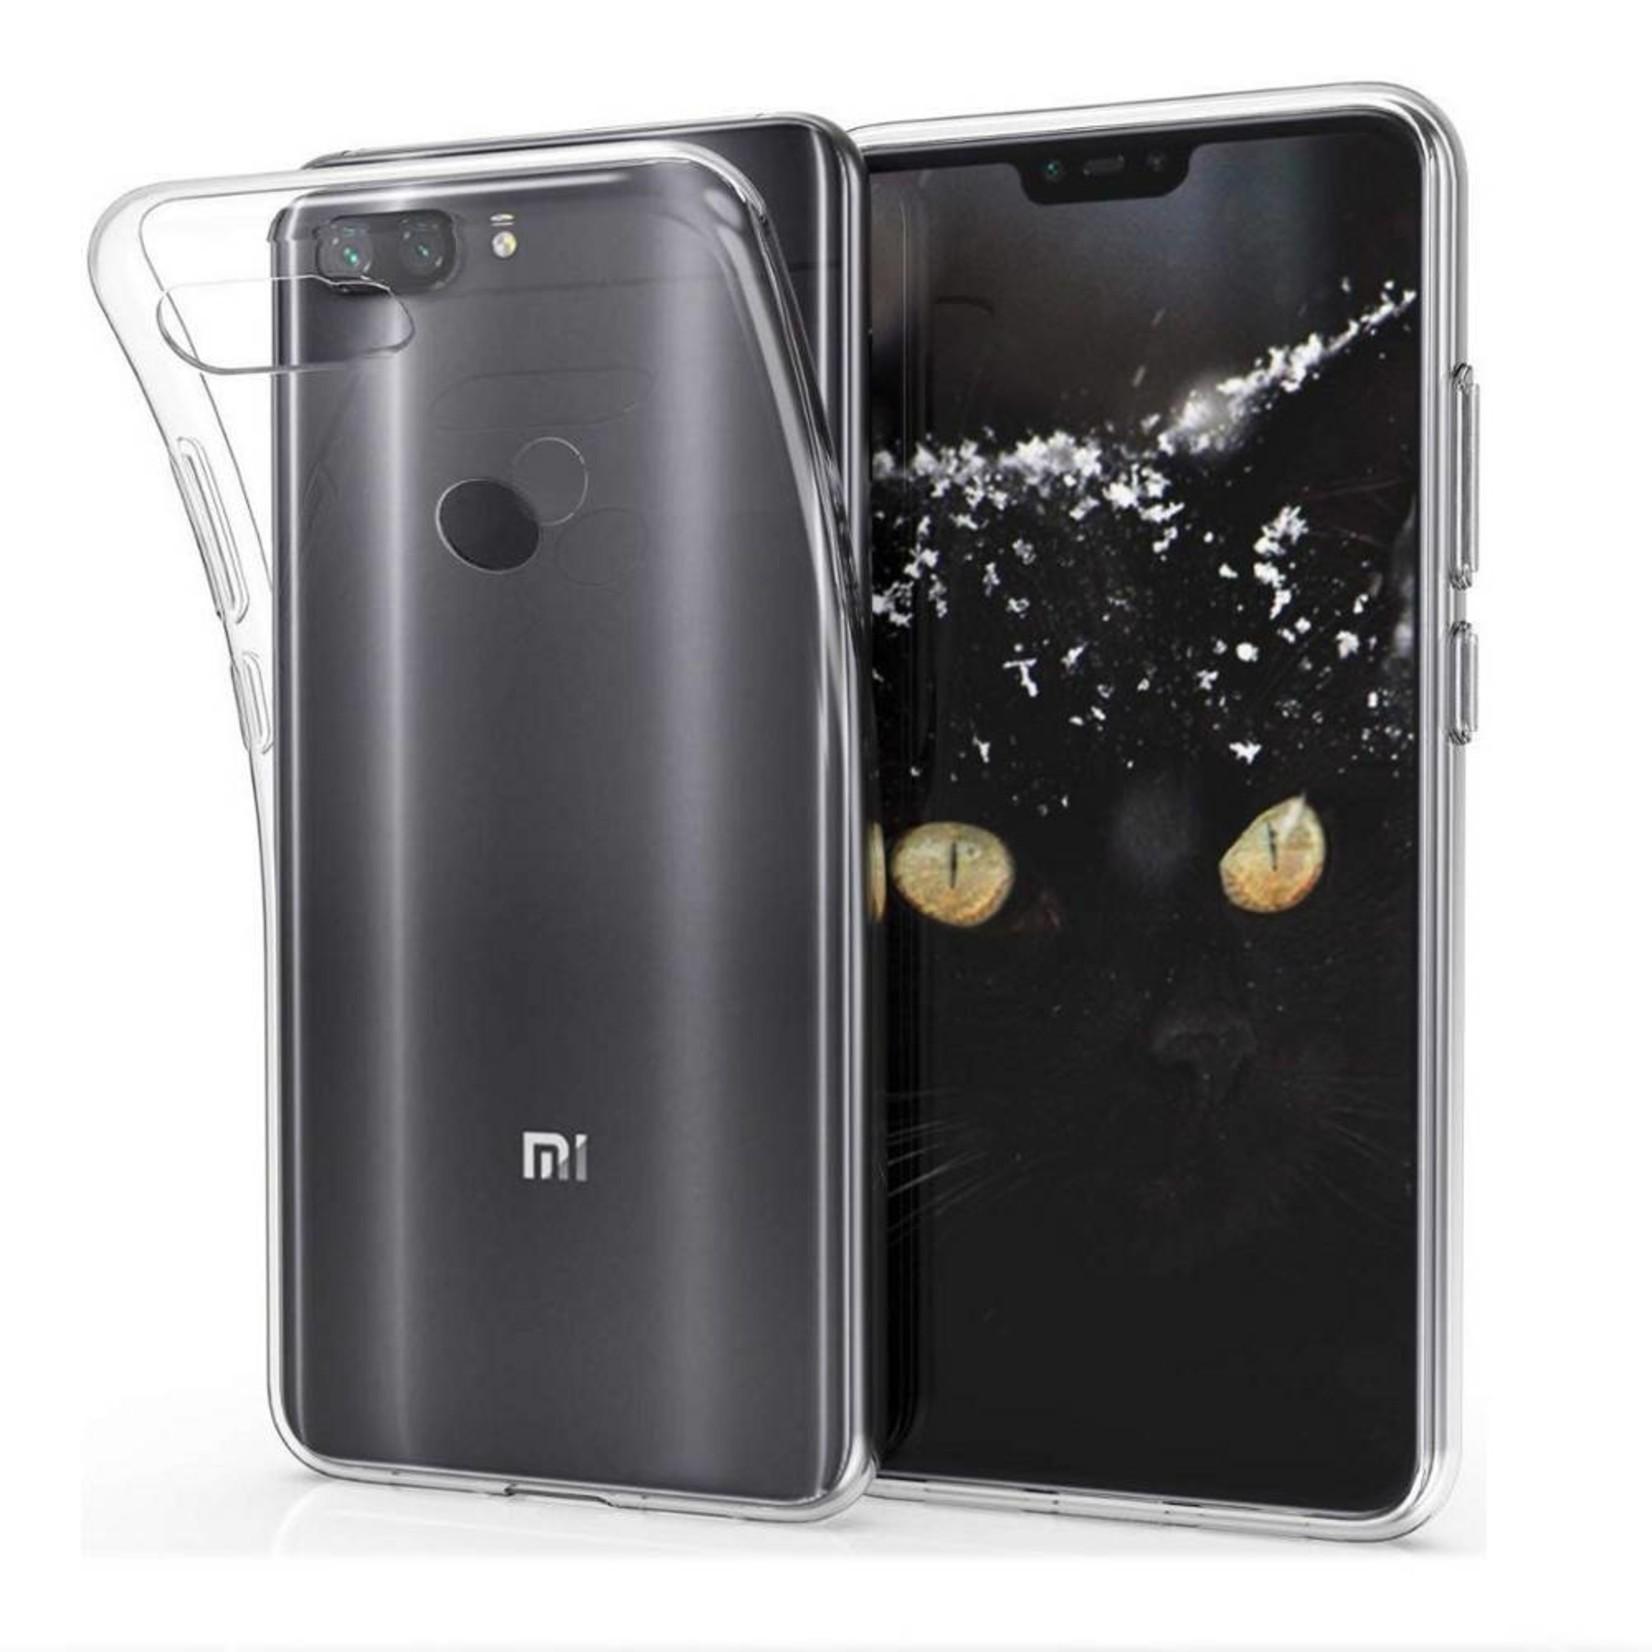 Colorfone Hoesje CoolSkin3T voor Xiaomi MI 8 Lite Transparant Wit